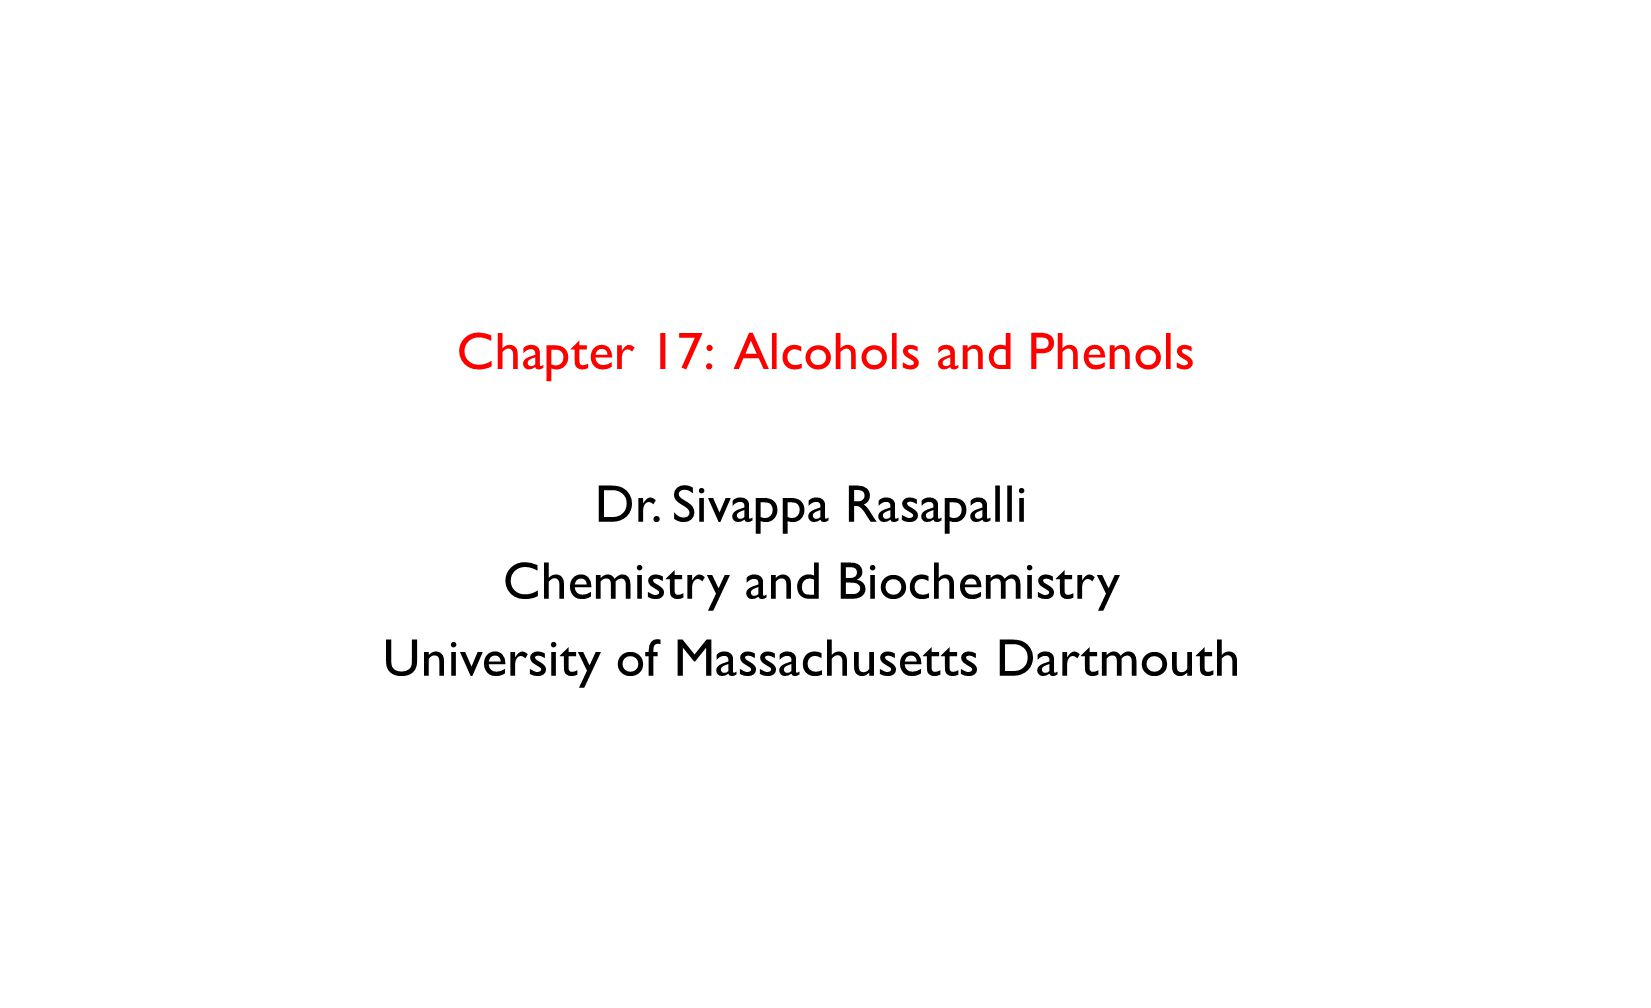 Chapter 17: Alcohols and Phenols Dr. Sivappa Rasapalli Chemistry and Biochemistry University of Massachusetts Dartmouth